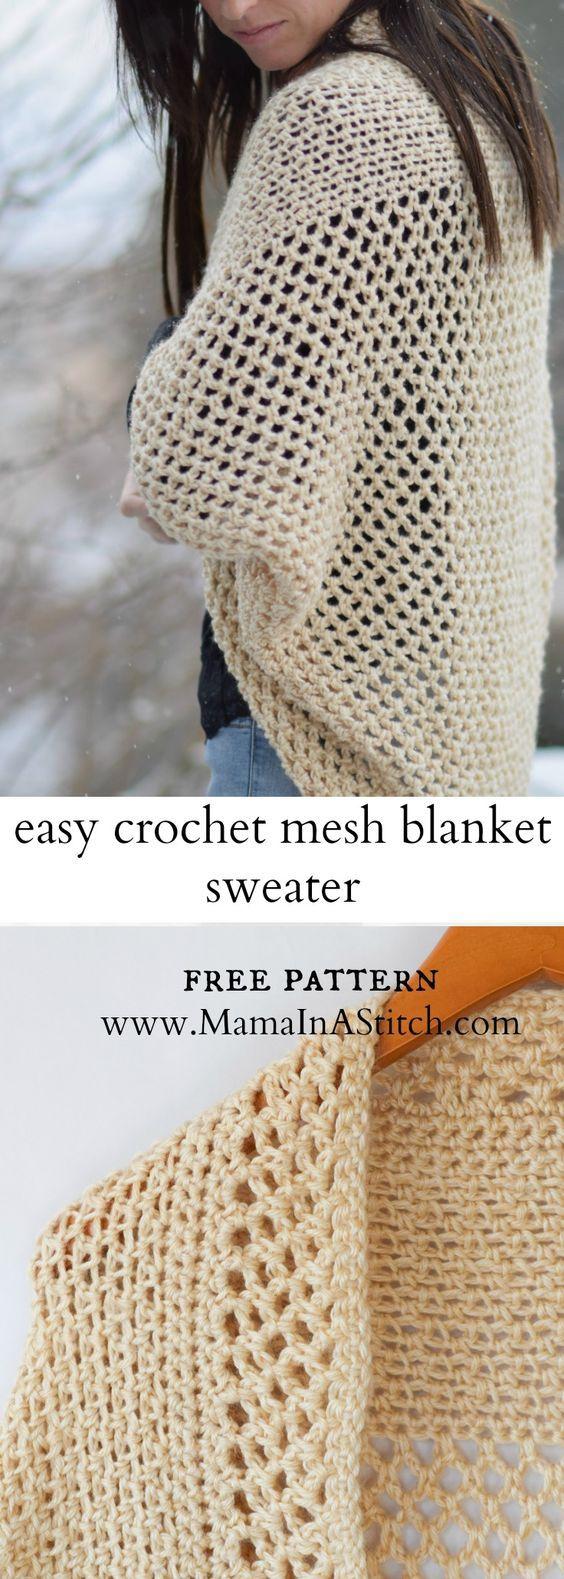 best crochet images on pinterest crochet patterns hand crafts